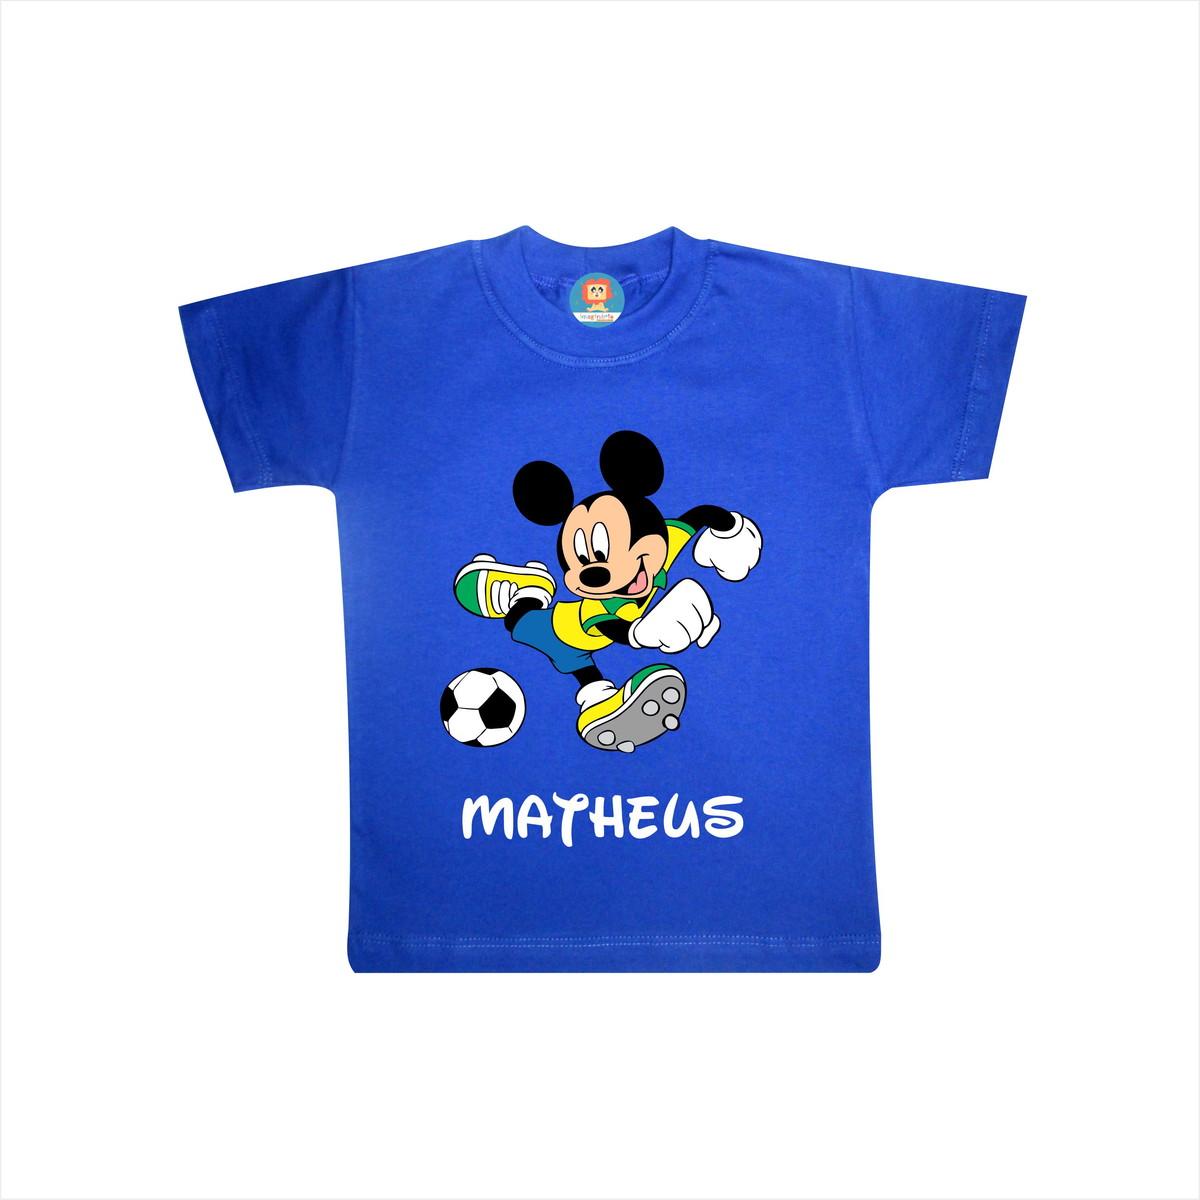 Body ou Camiseta Mickey Brasil Copa do Mundo no Elo7  be14d9fab534c